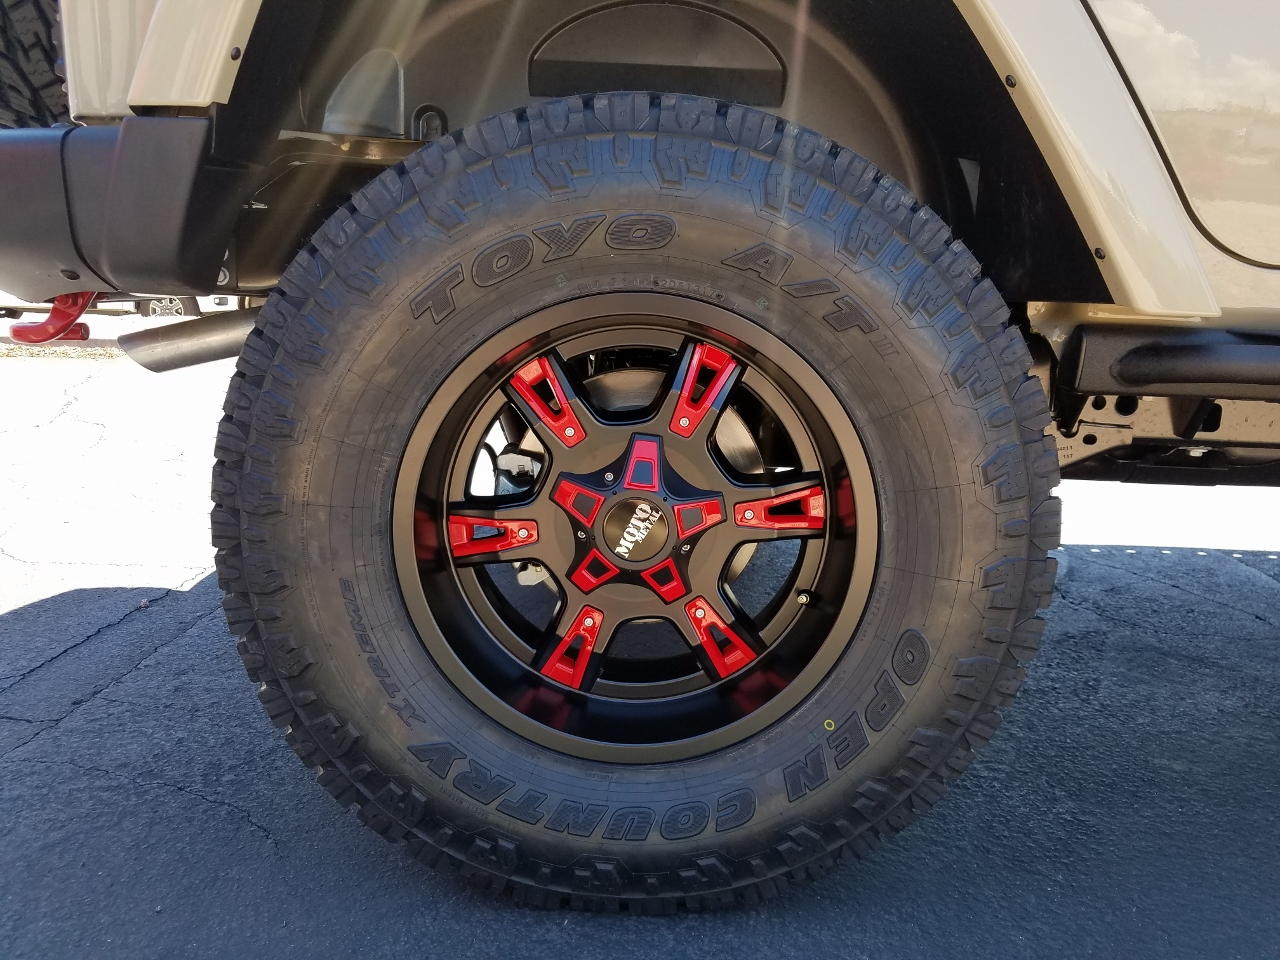 2017 Jeep Rubicon Recon Gobi